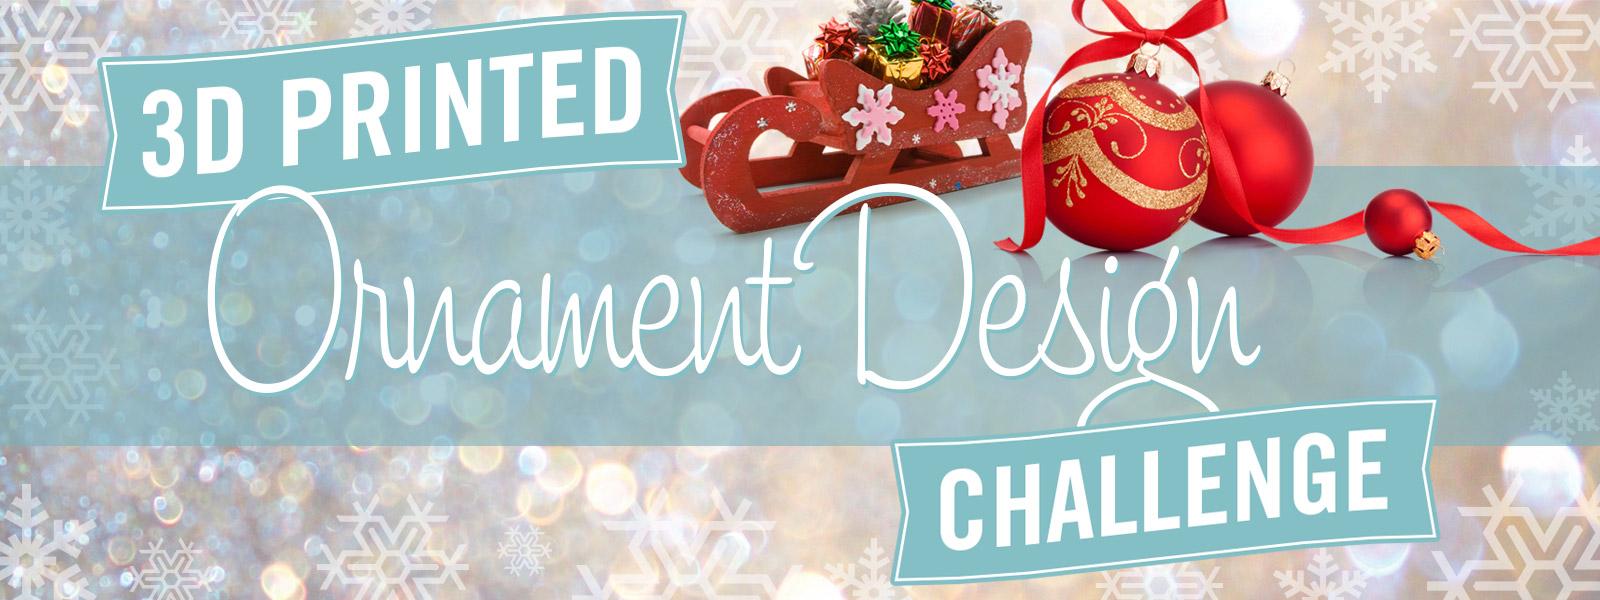 3d printed ornament design challenge m4hsunfo